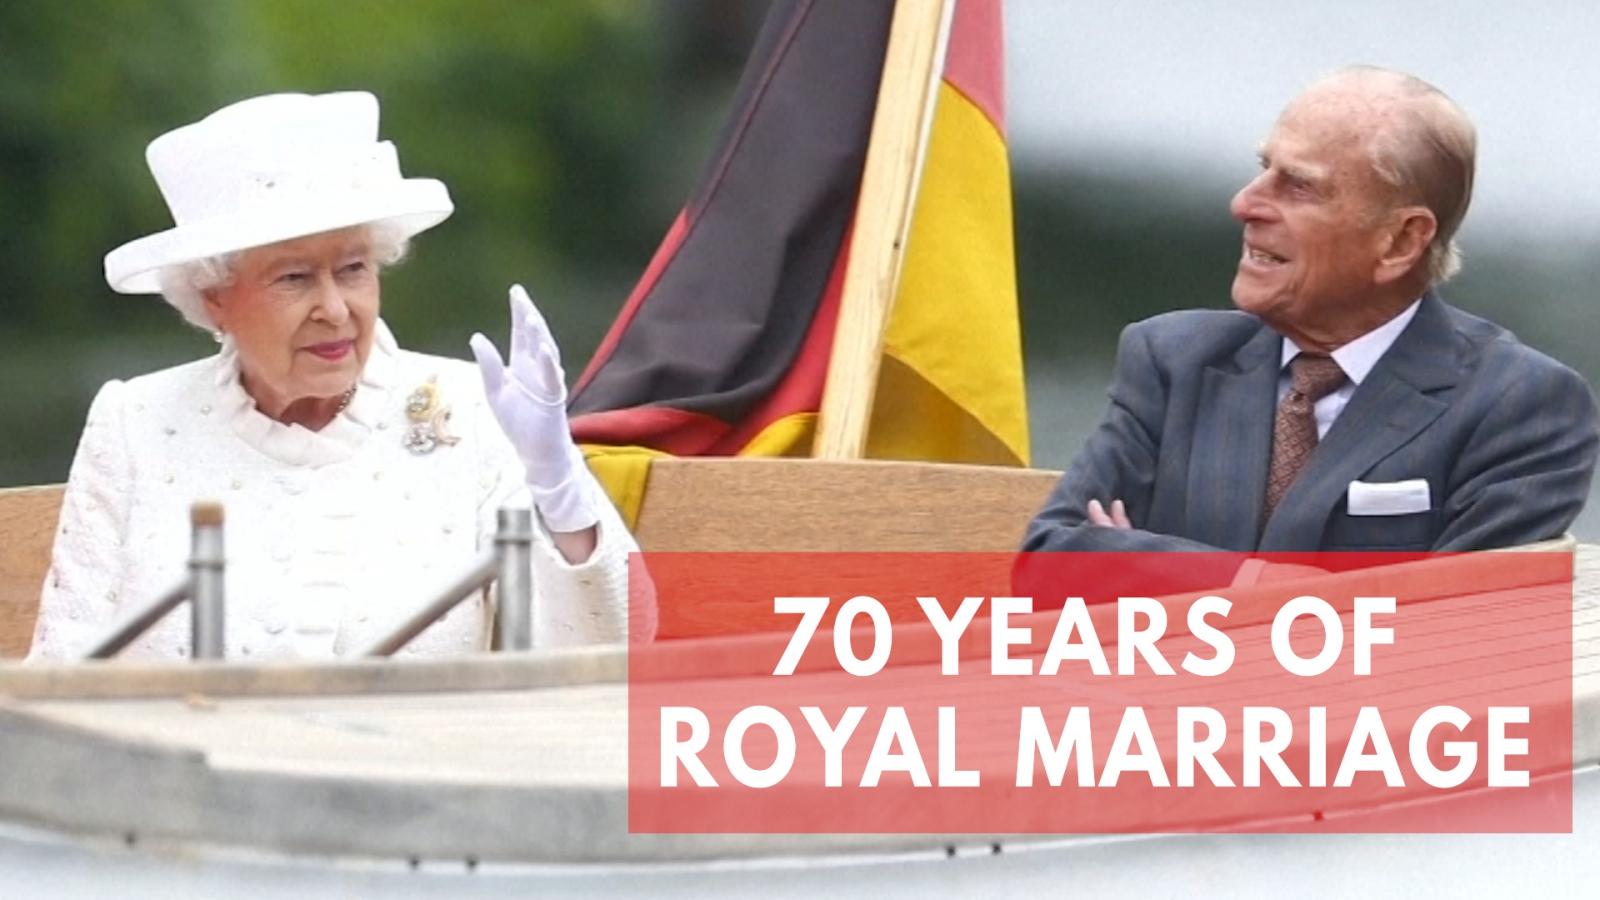 queen-elizabeth-ii-celebrates-70th-wedding-anniversary-with-prince-philip